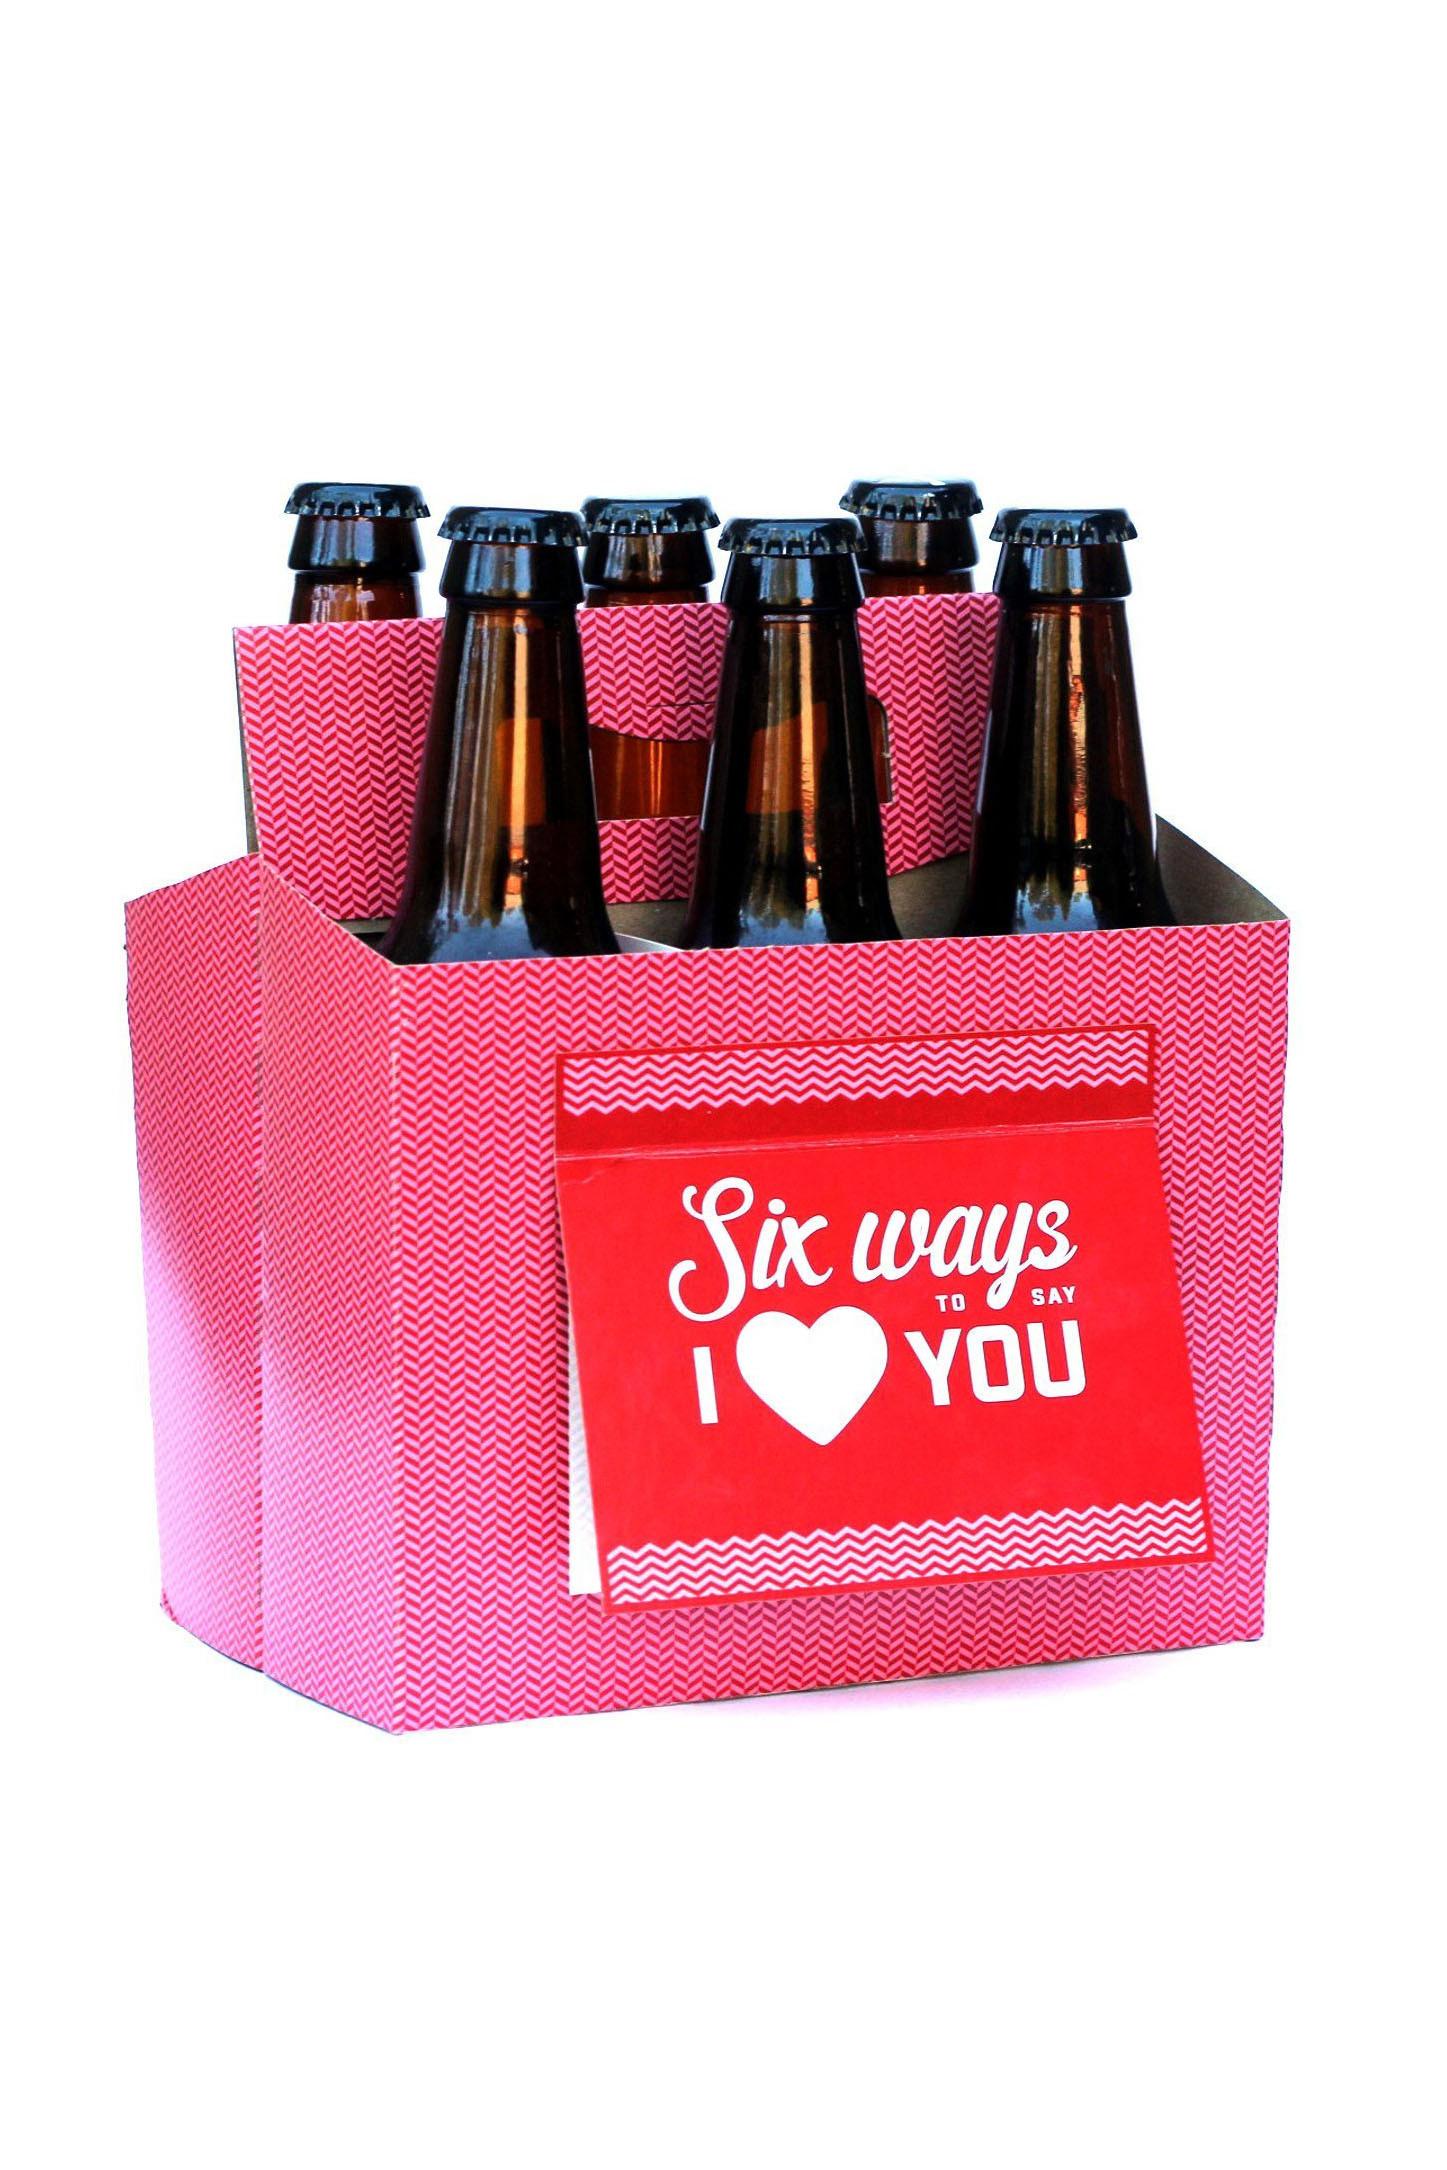 Valentine Guy Gift Ideas  30 Best Valentine s Day Gifts for Him 2017 Good Ideas